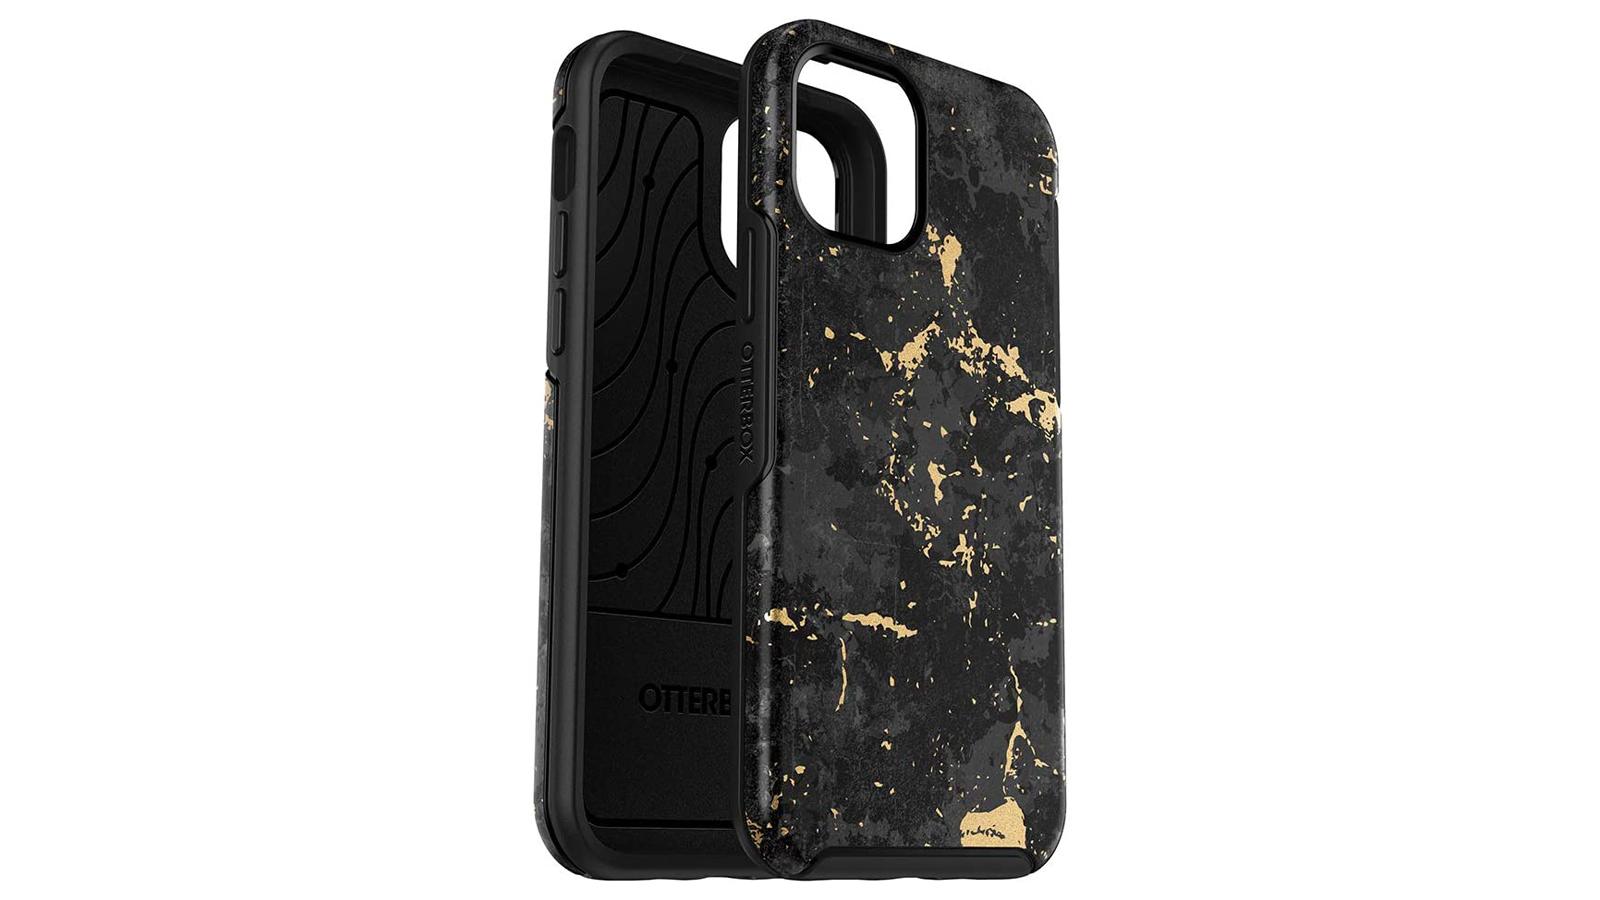 OtterBox Symmetry Series phone case